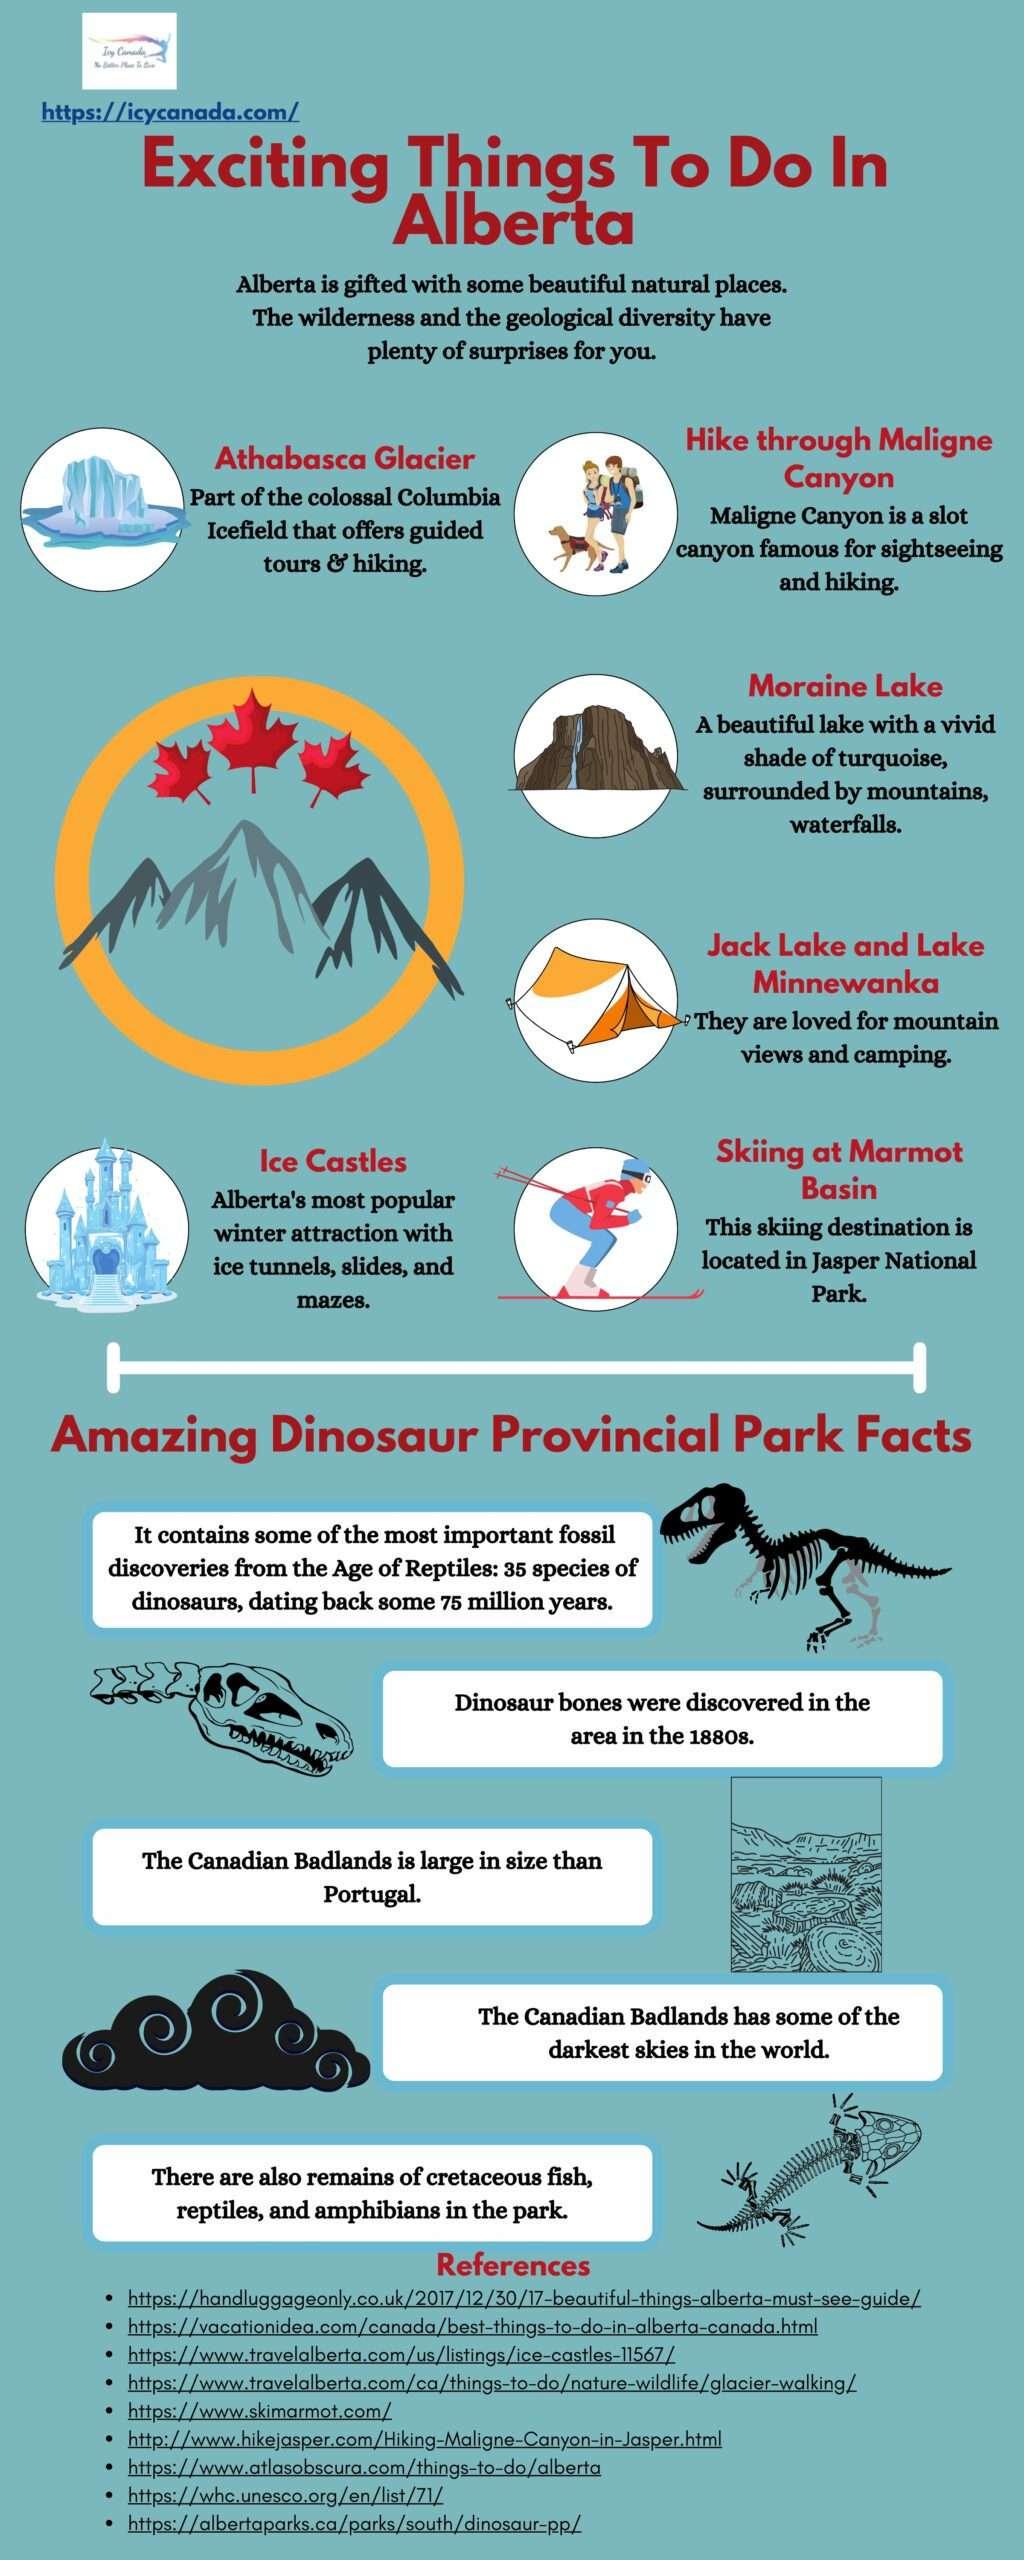 Fun Facts About Dinosaur Provincial Park